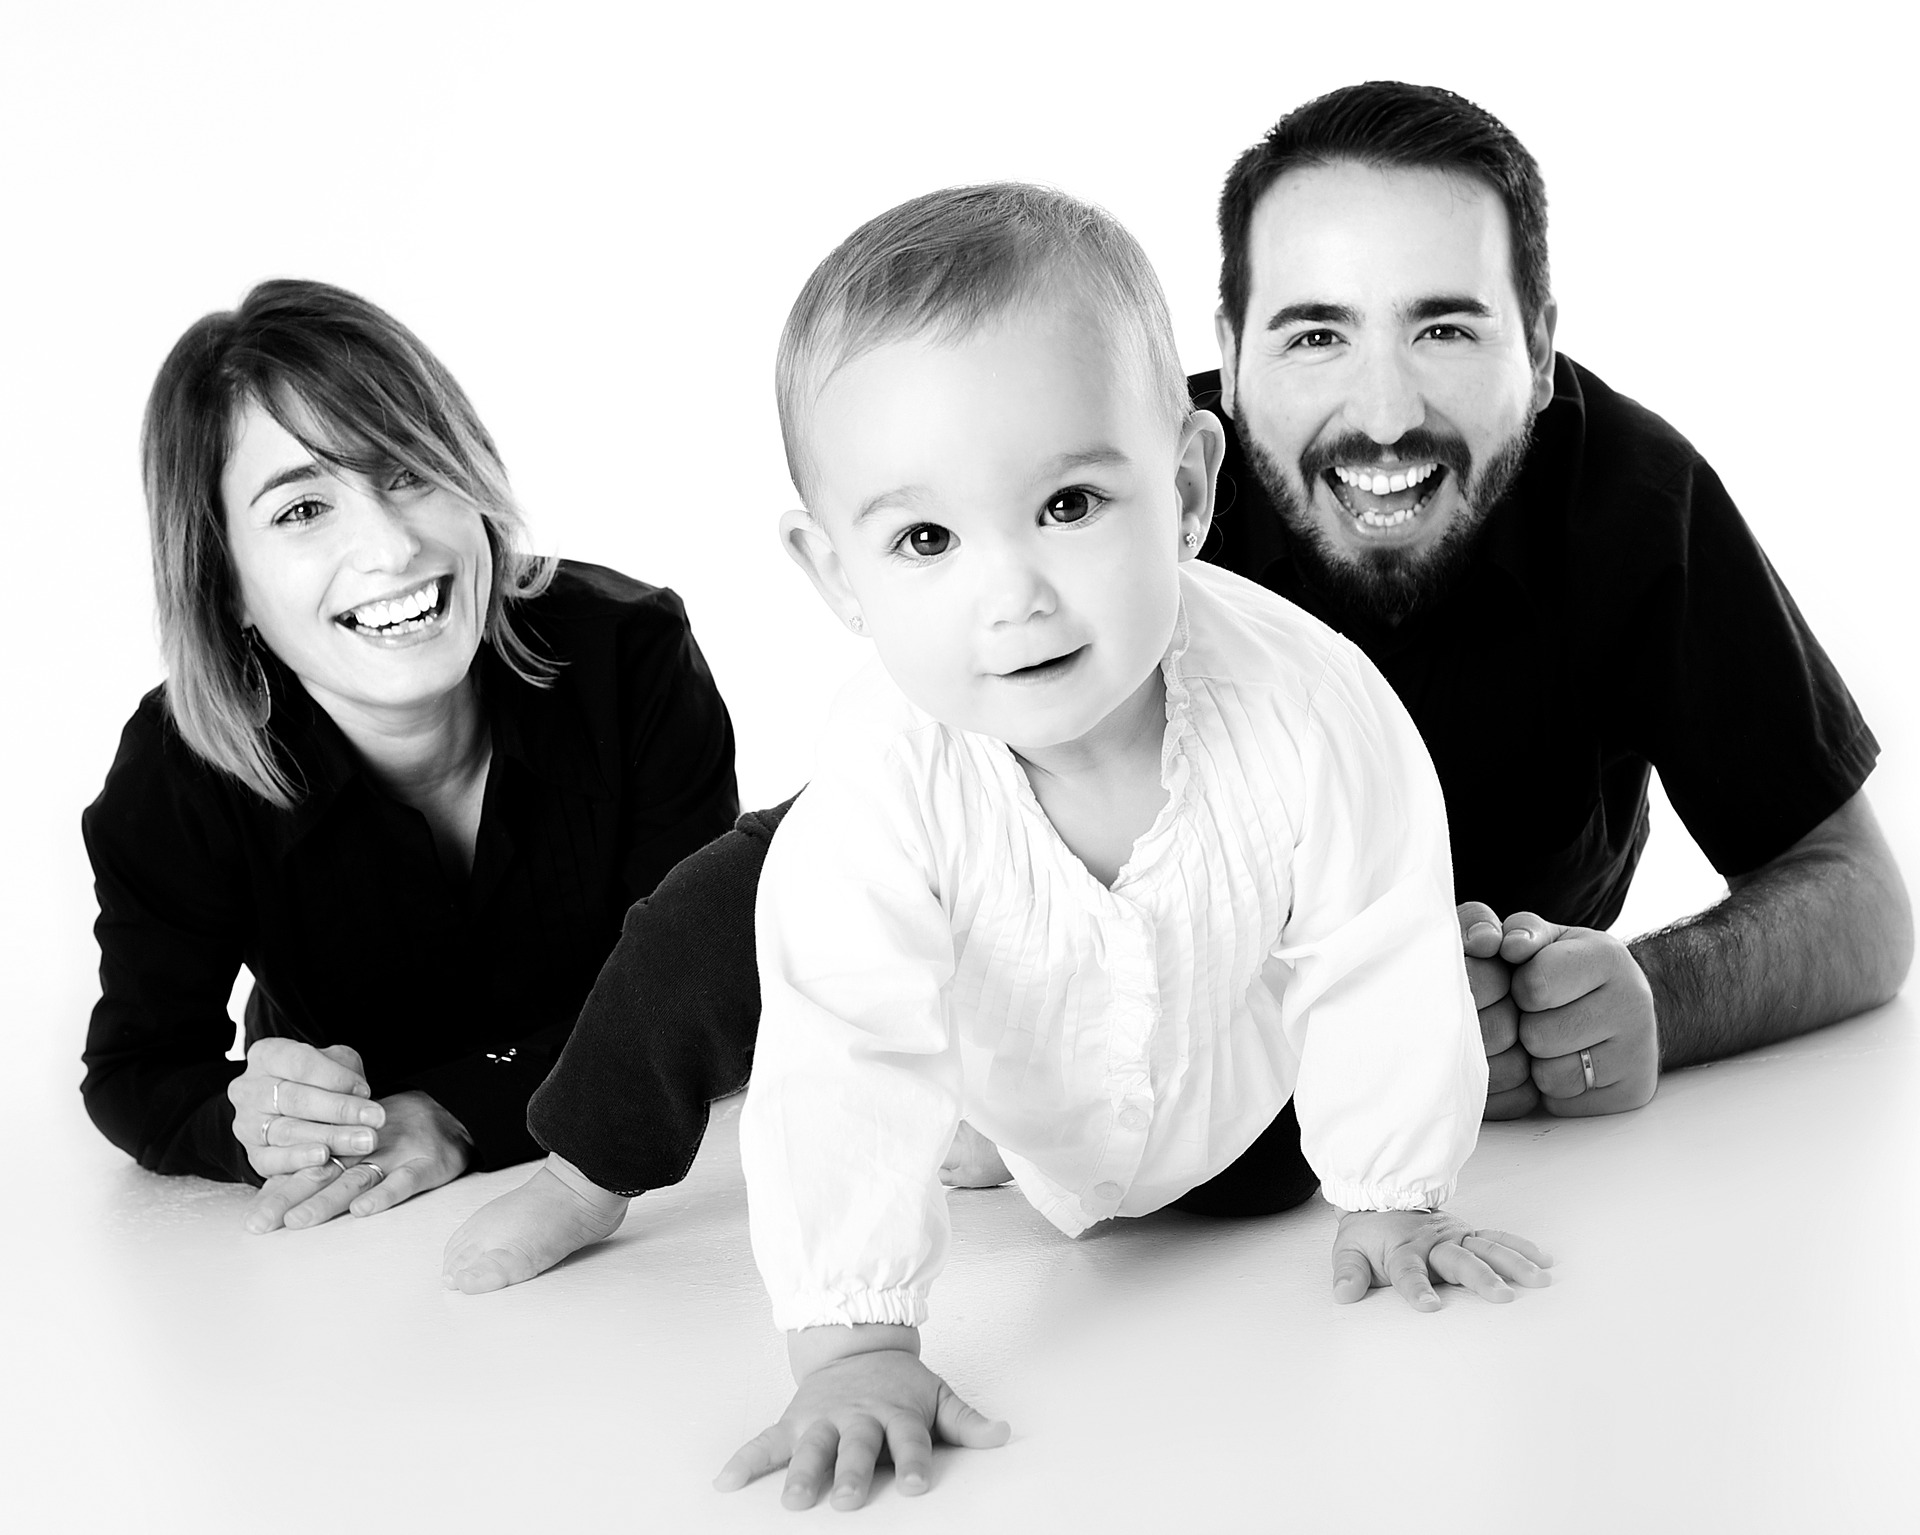 family-g48e34ee89_1920